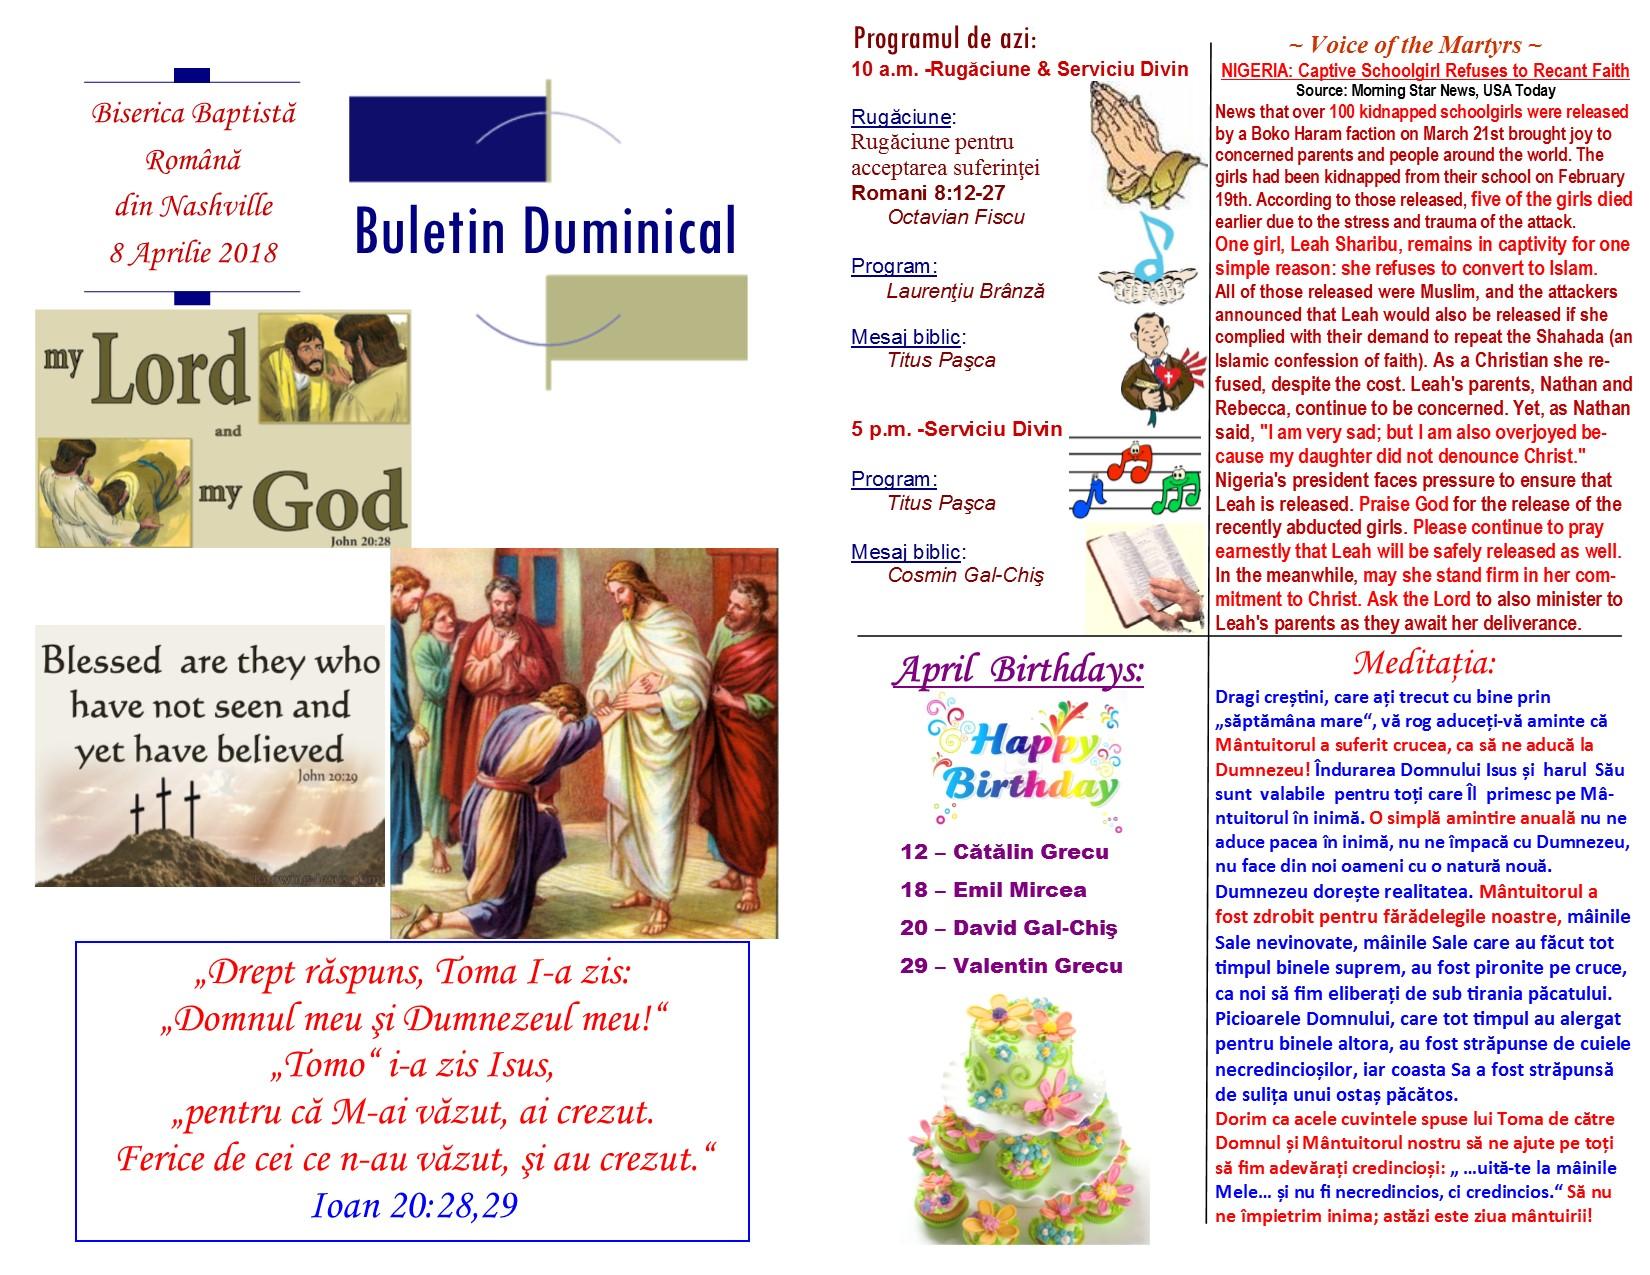 Buletin 04-08-18 page 1 & 2